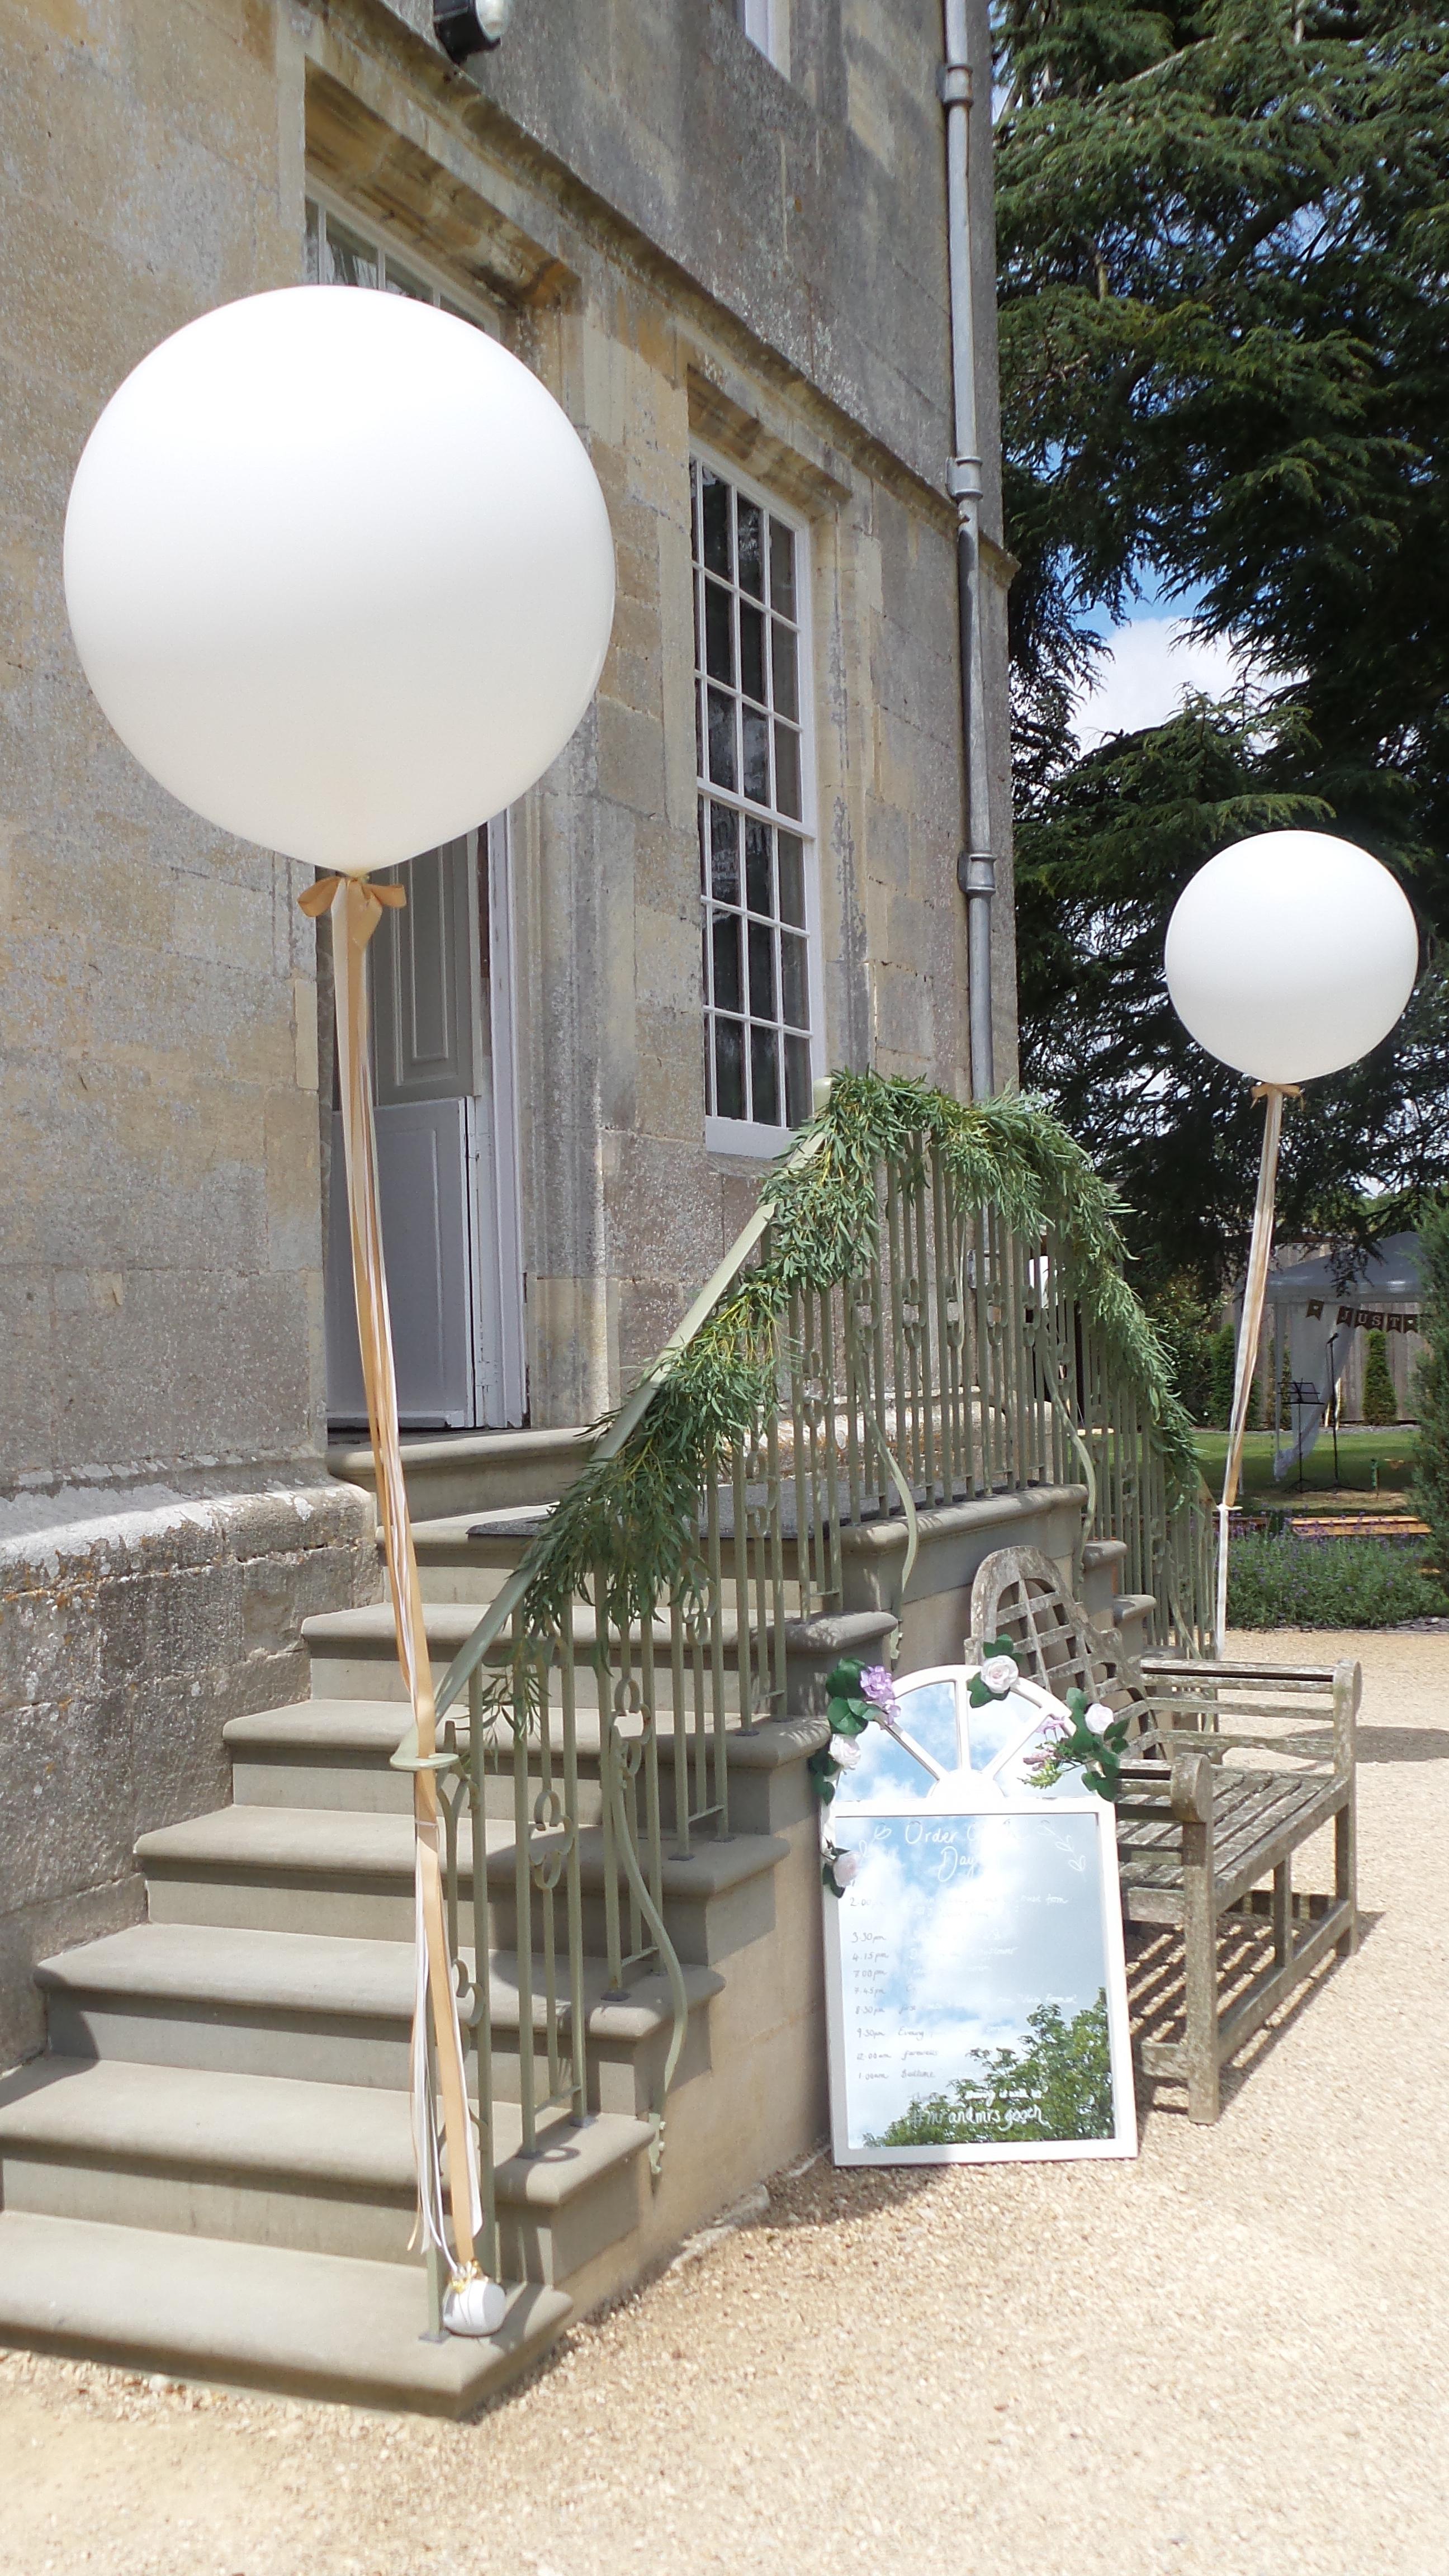 Elmore Court Giant Balloons